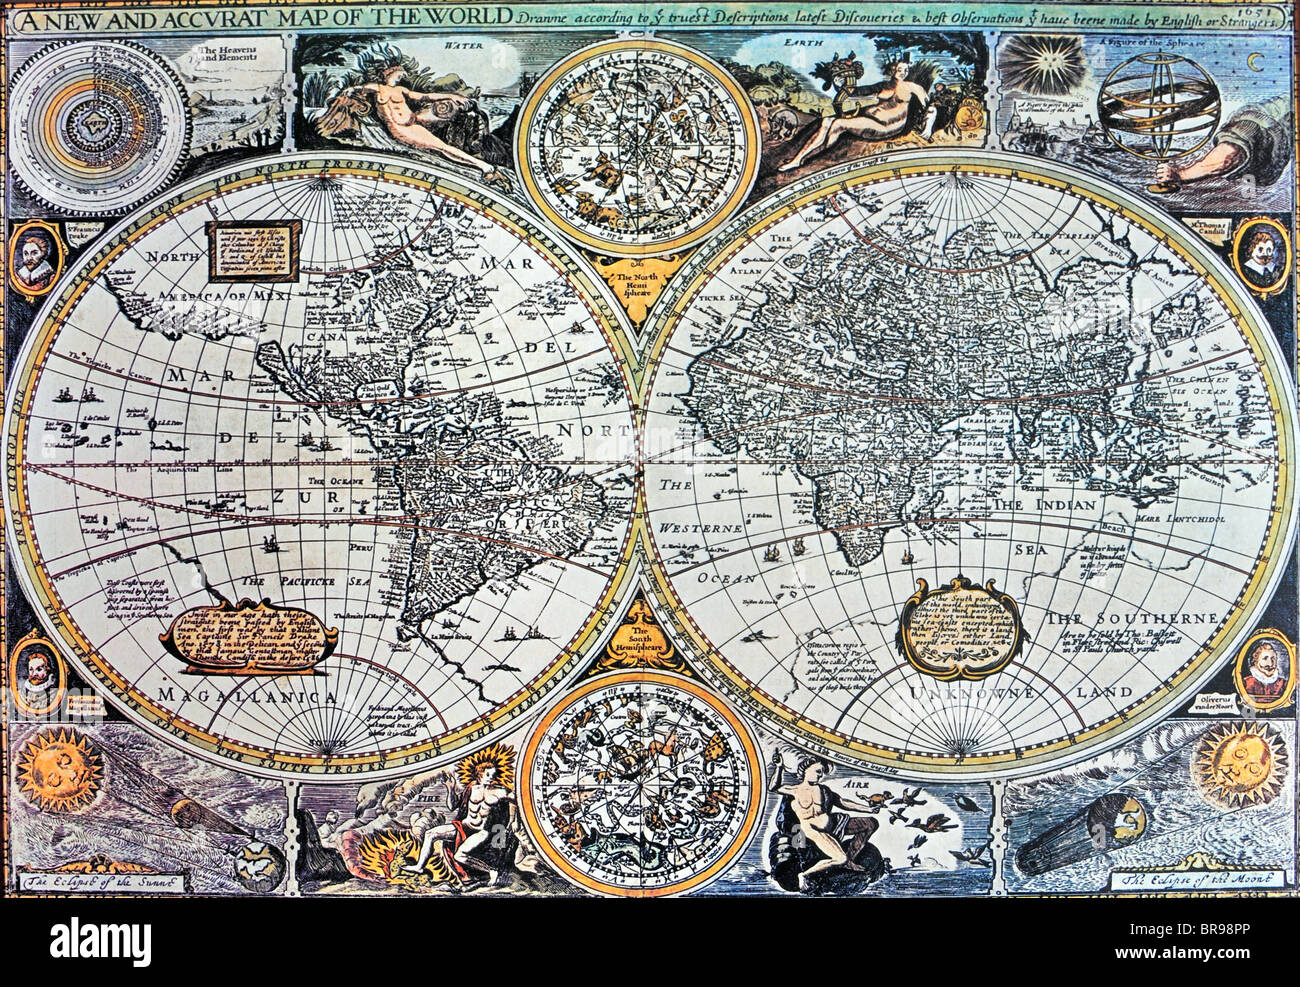 A Copy Of A European Th Century World Map Showing The Know World - 17th century world map